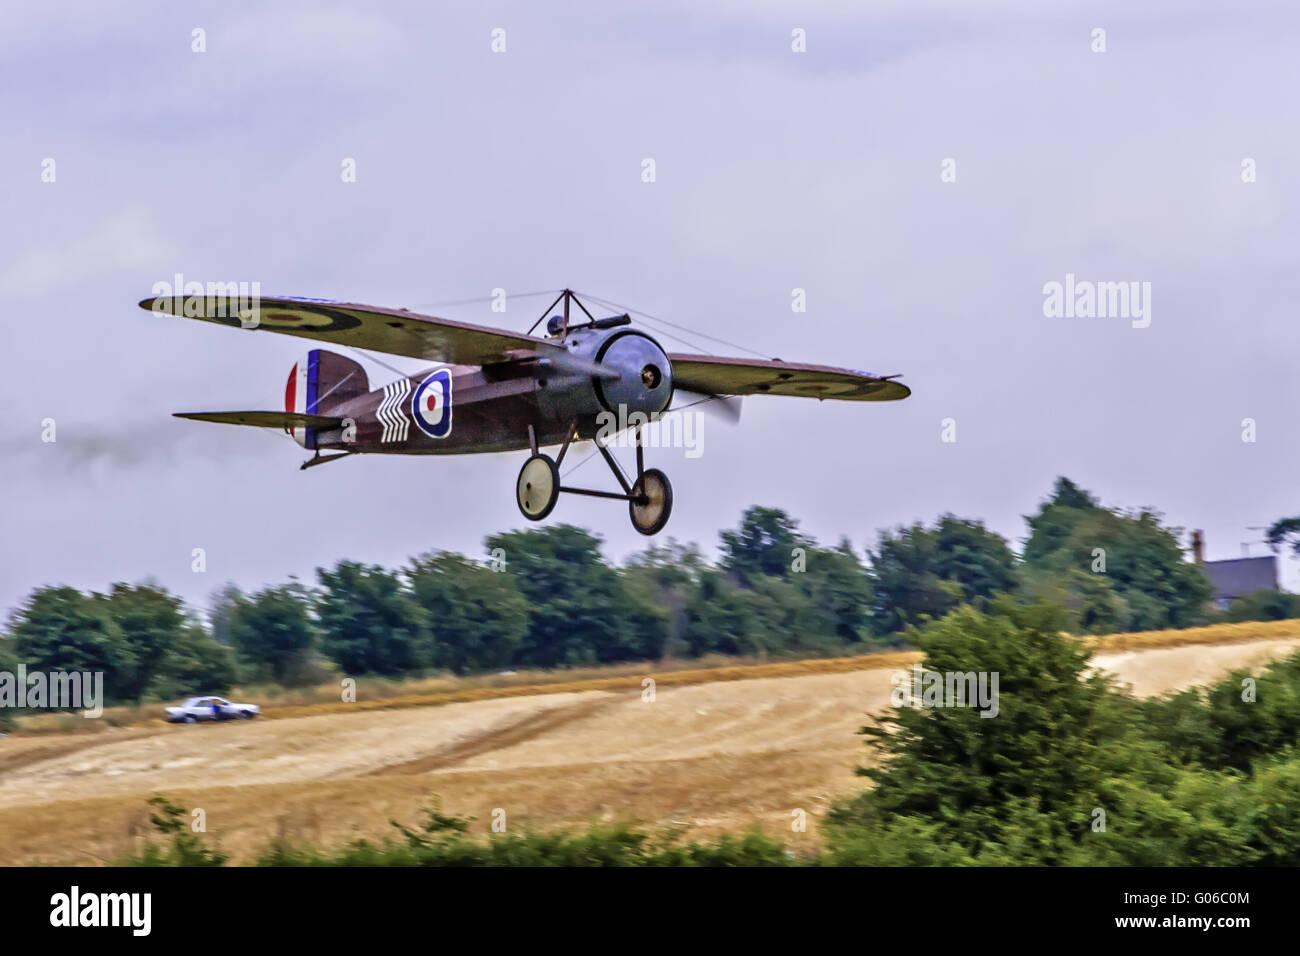 Bristol M1C Aircraft Shuttleworth Collection UK - Stock Image